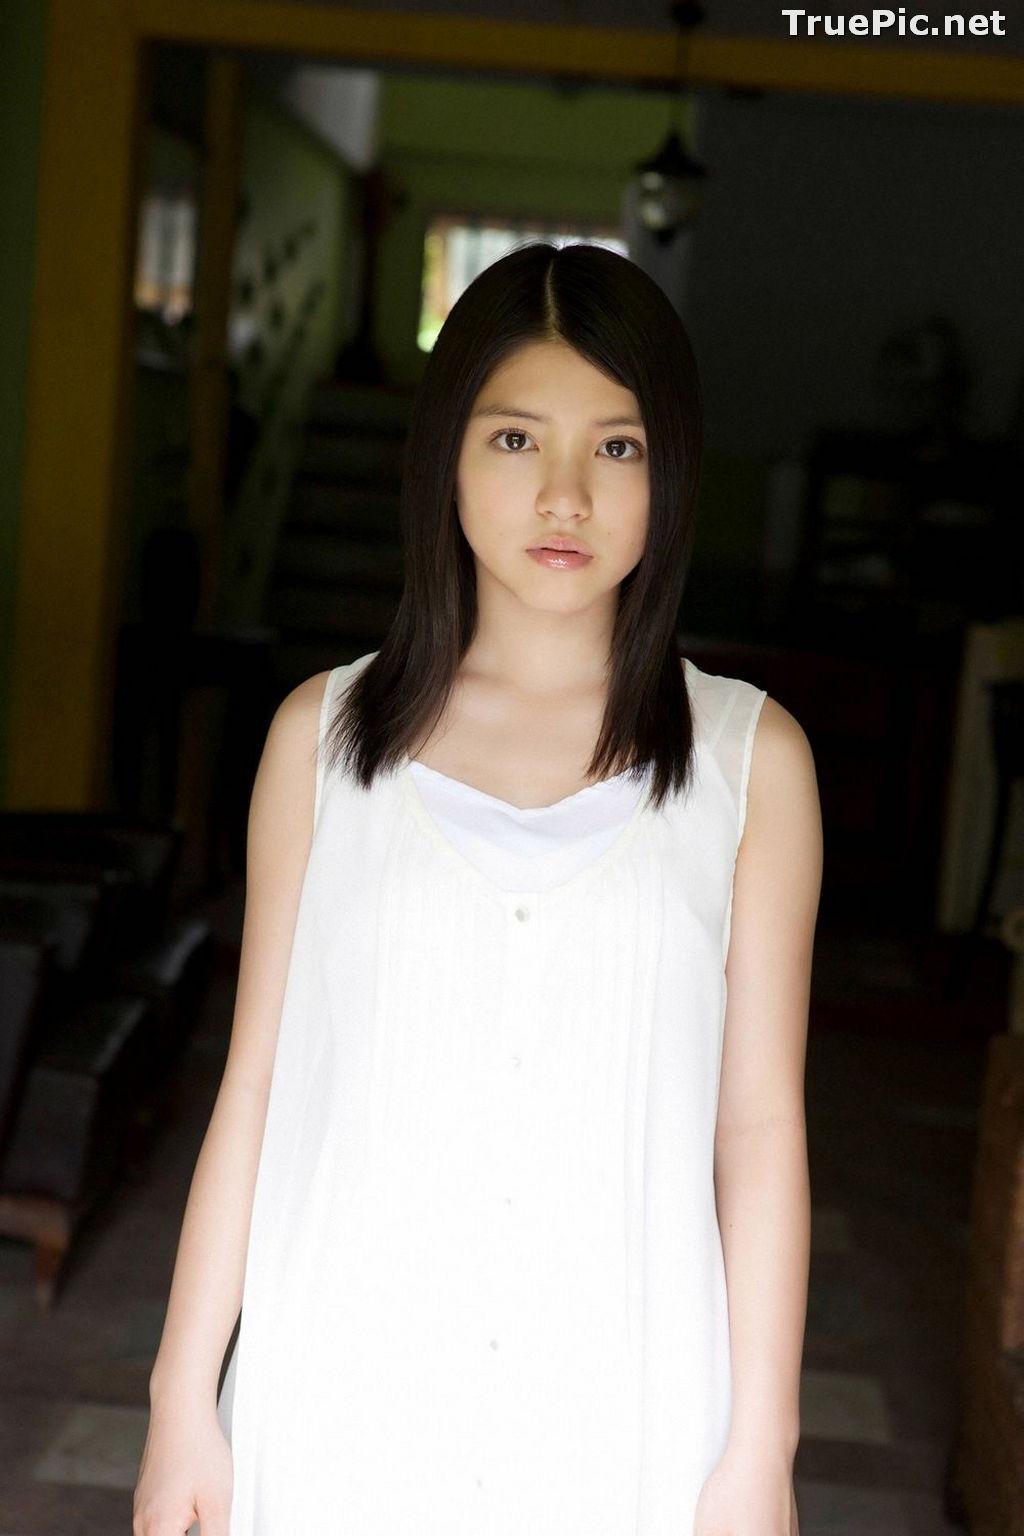 Image [YS Web] Vol.506 - Japanese Actress and Singer - Umika Kawashima - TruePic.net - Picture-11